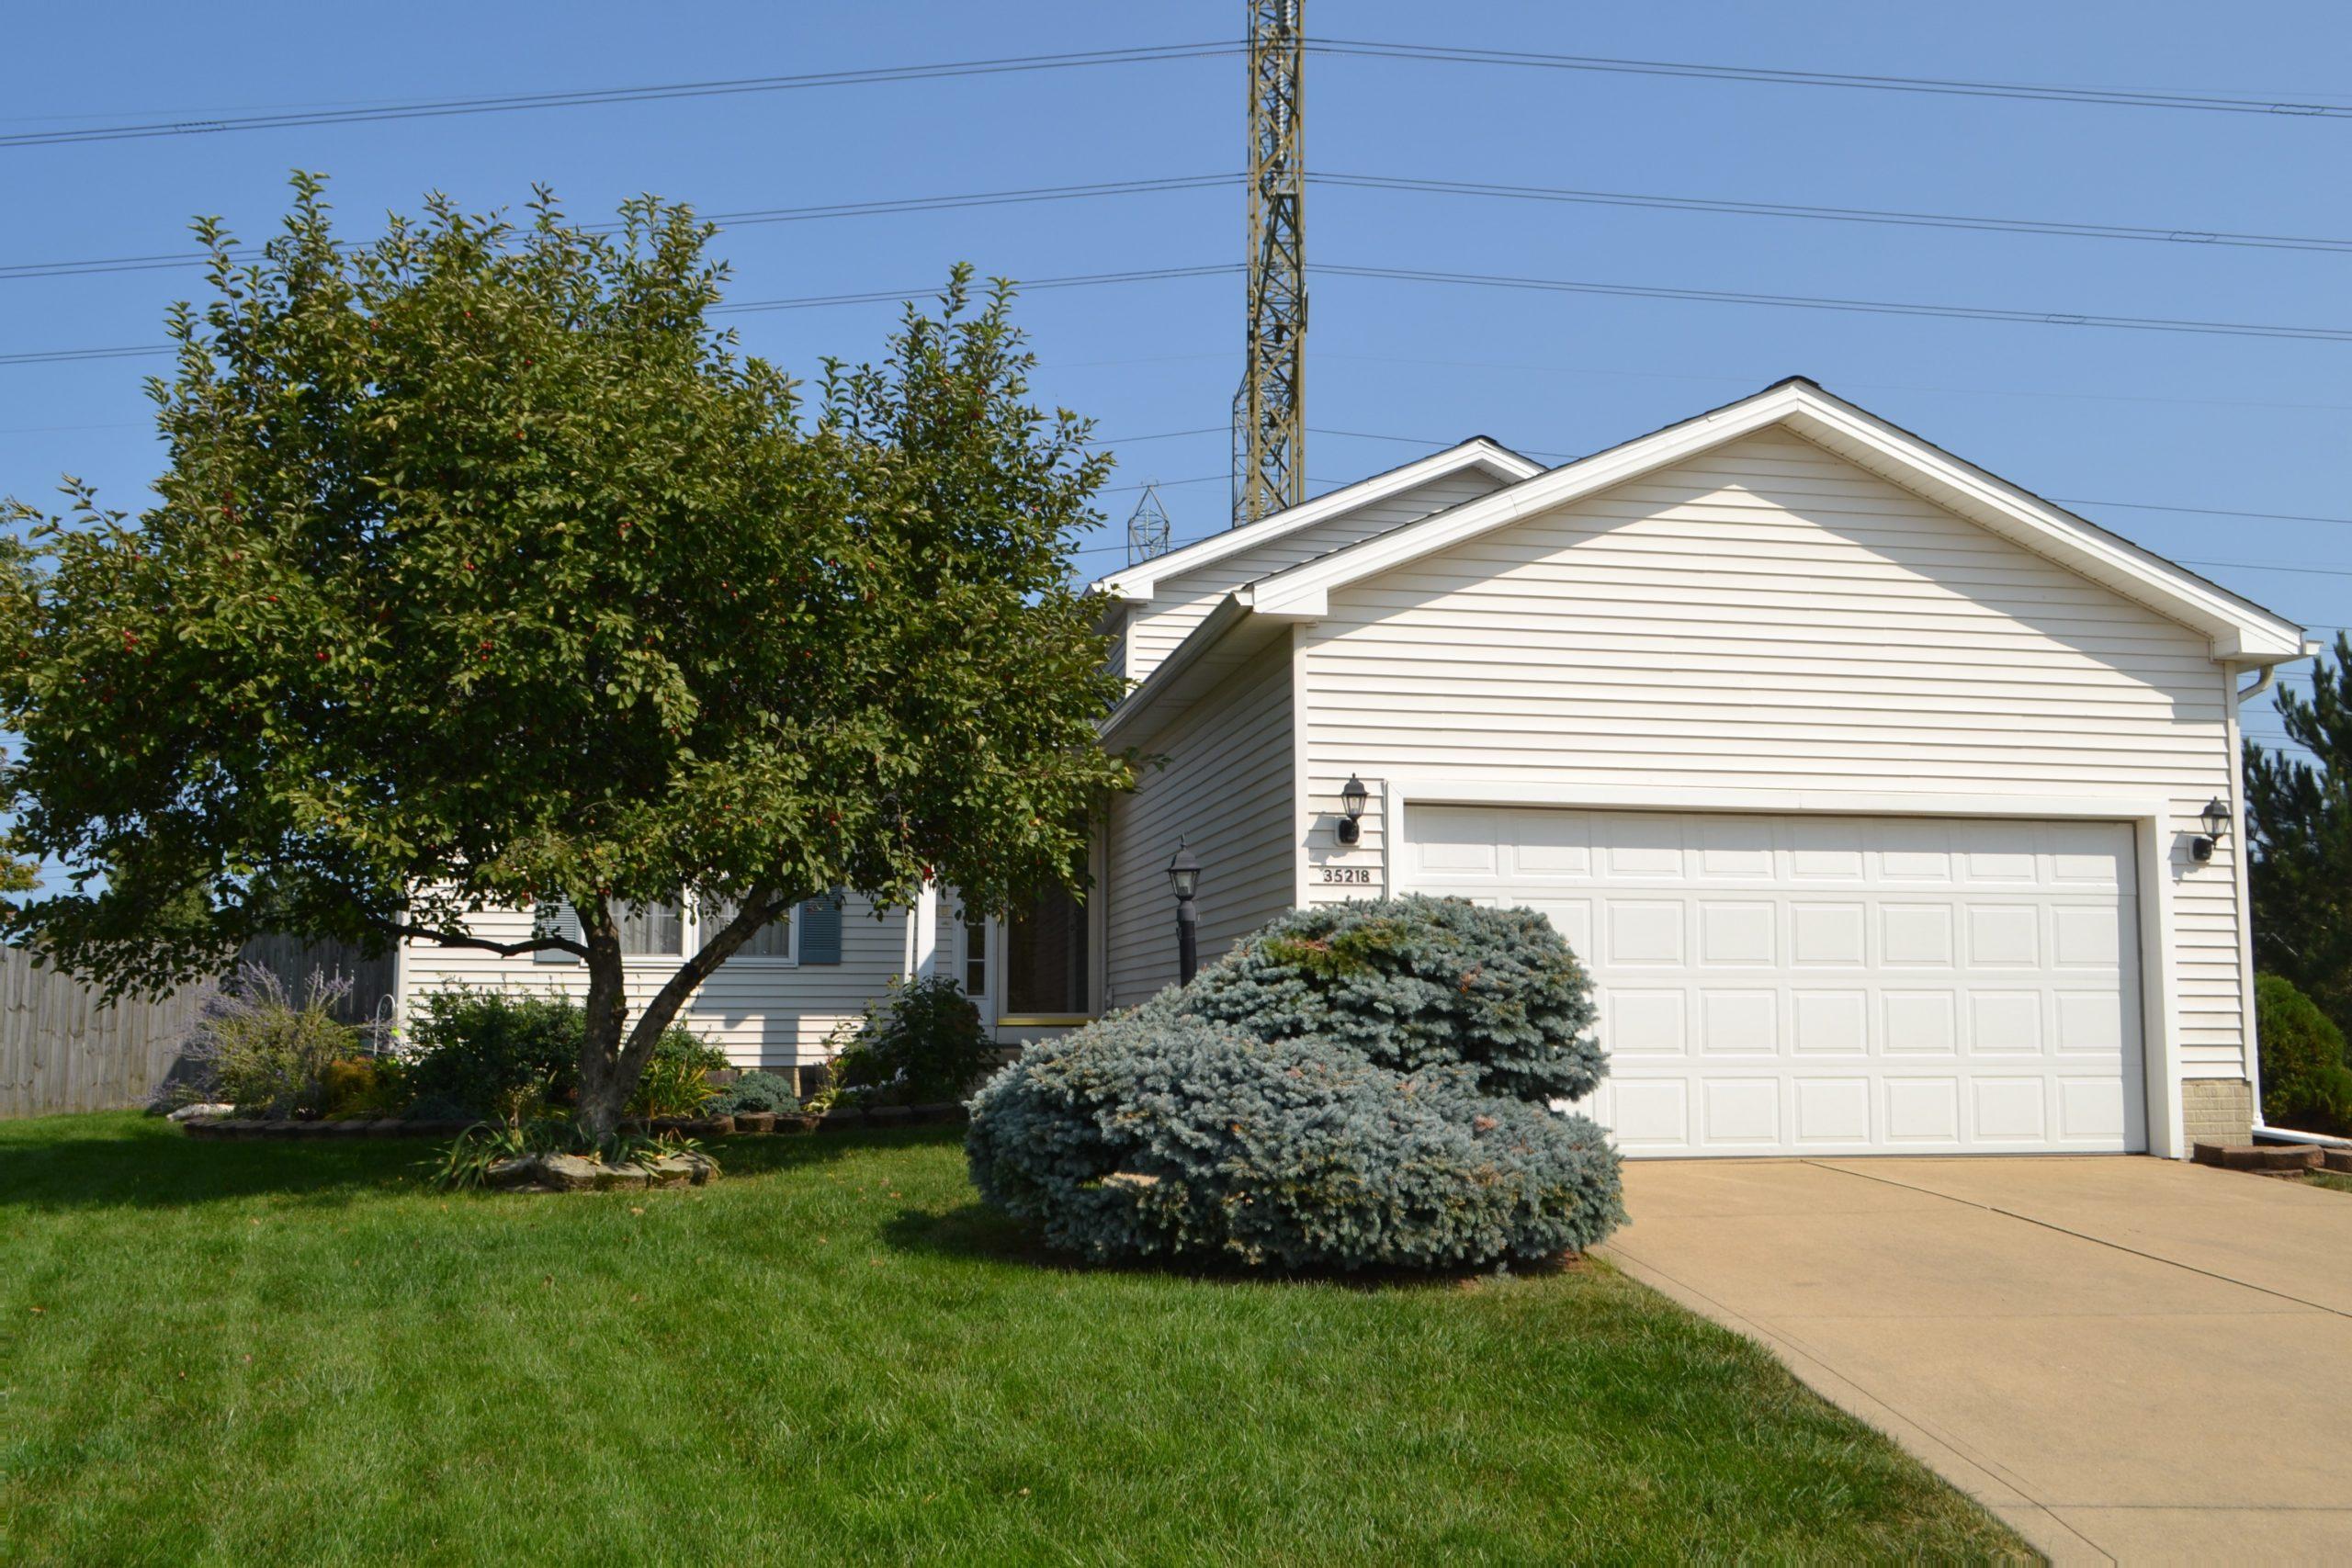 North Ridgeville, OH - $214,900